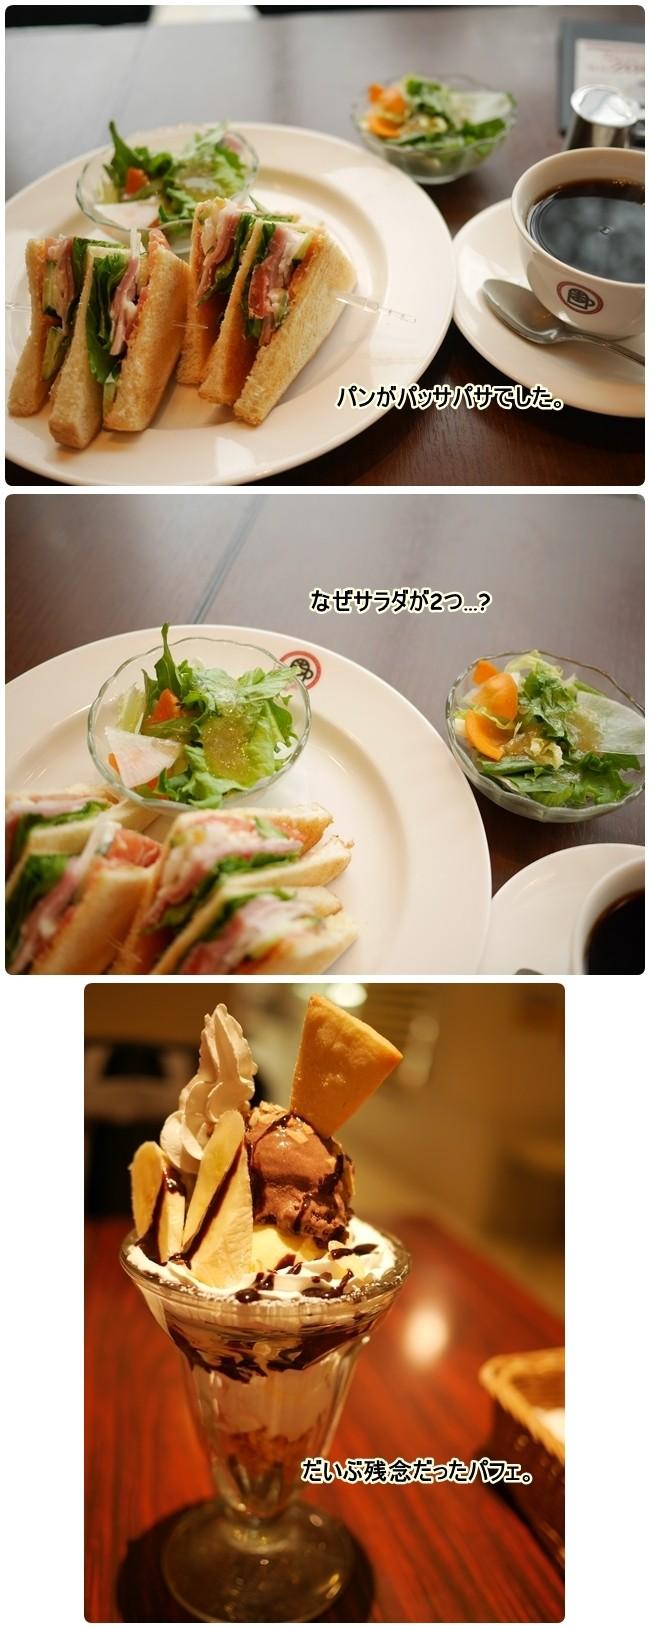 ■P1200649-vert